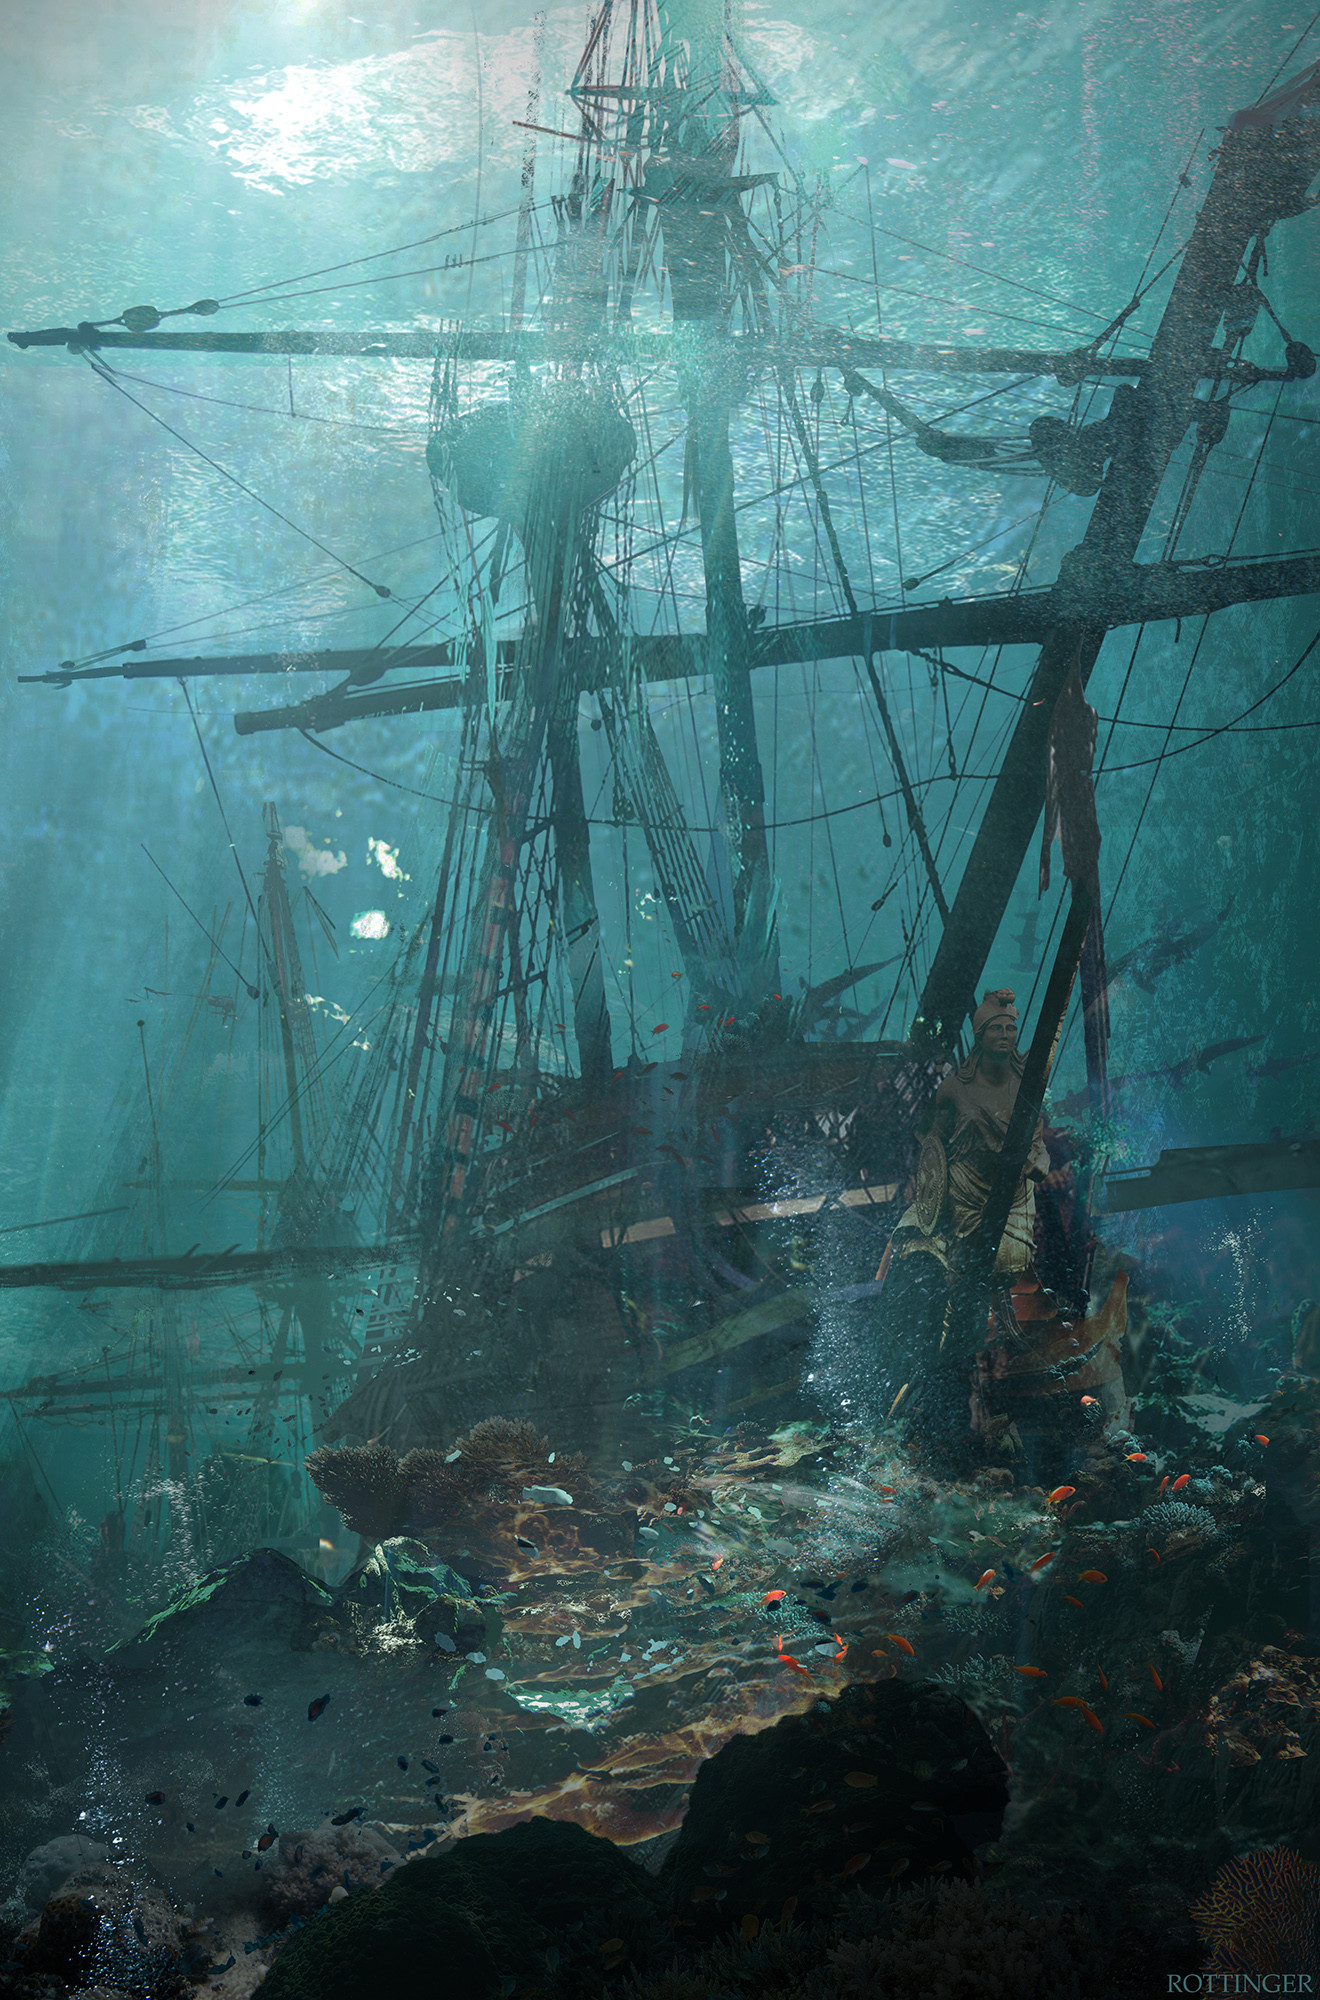 Blake rottinger 2 12 16 wreck web